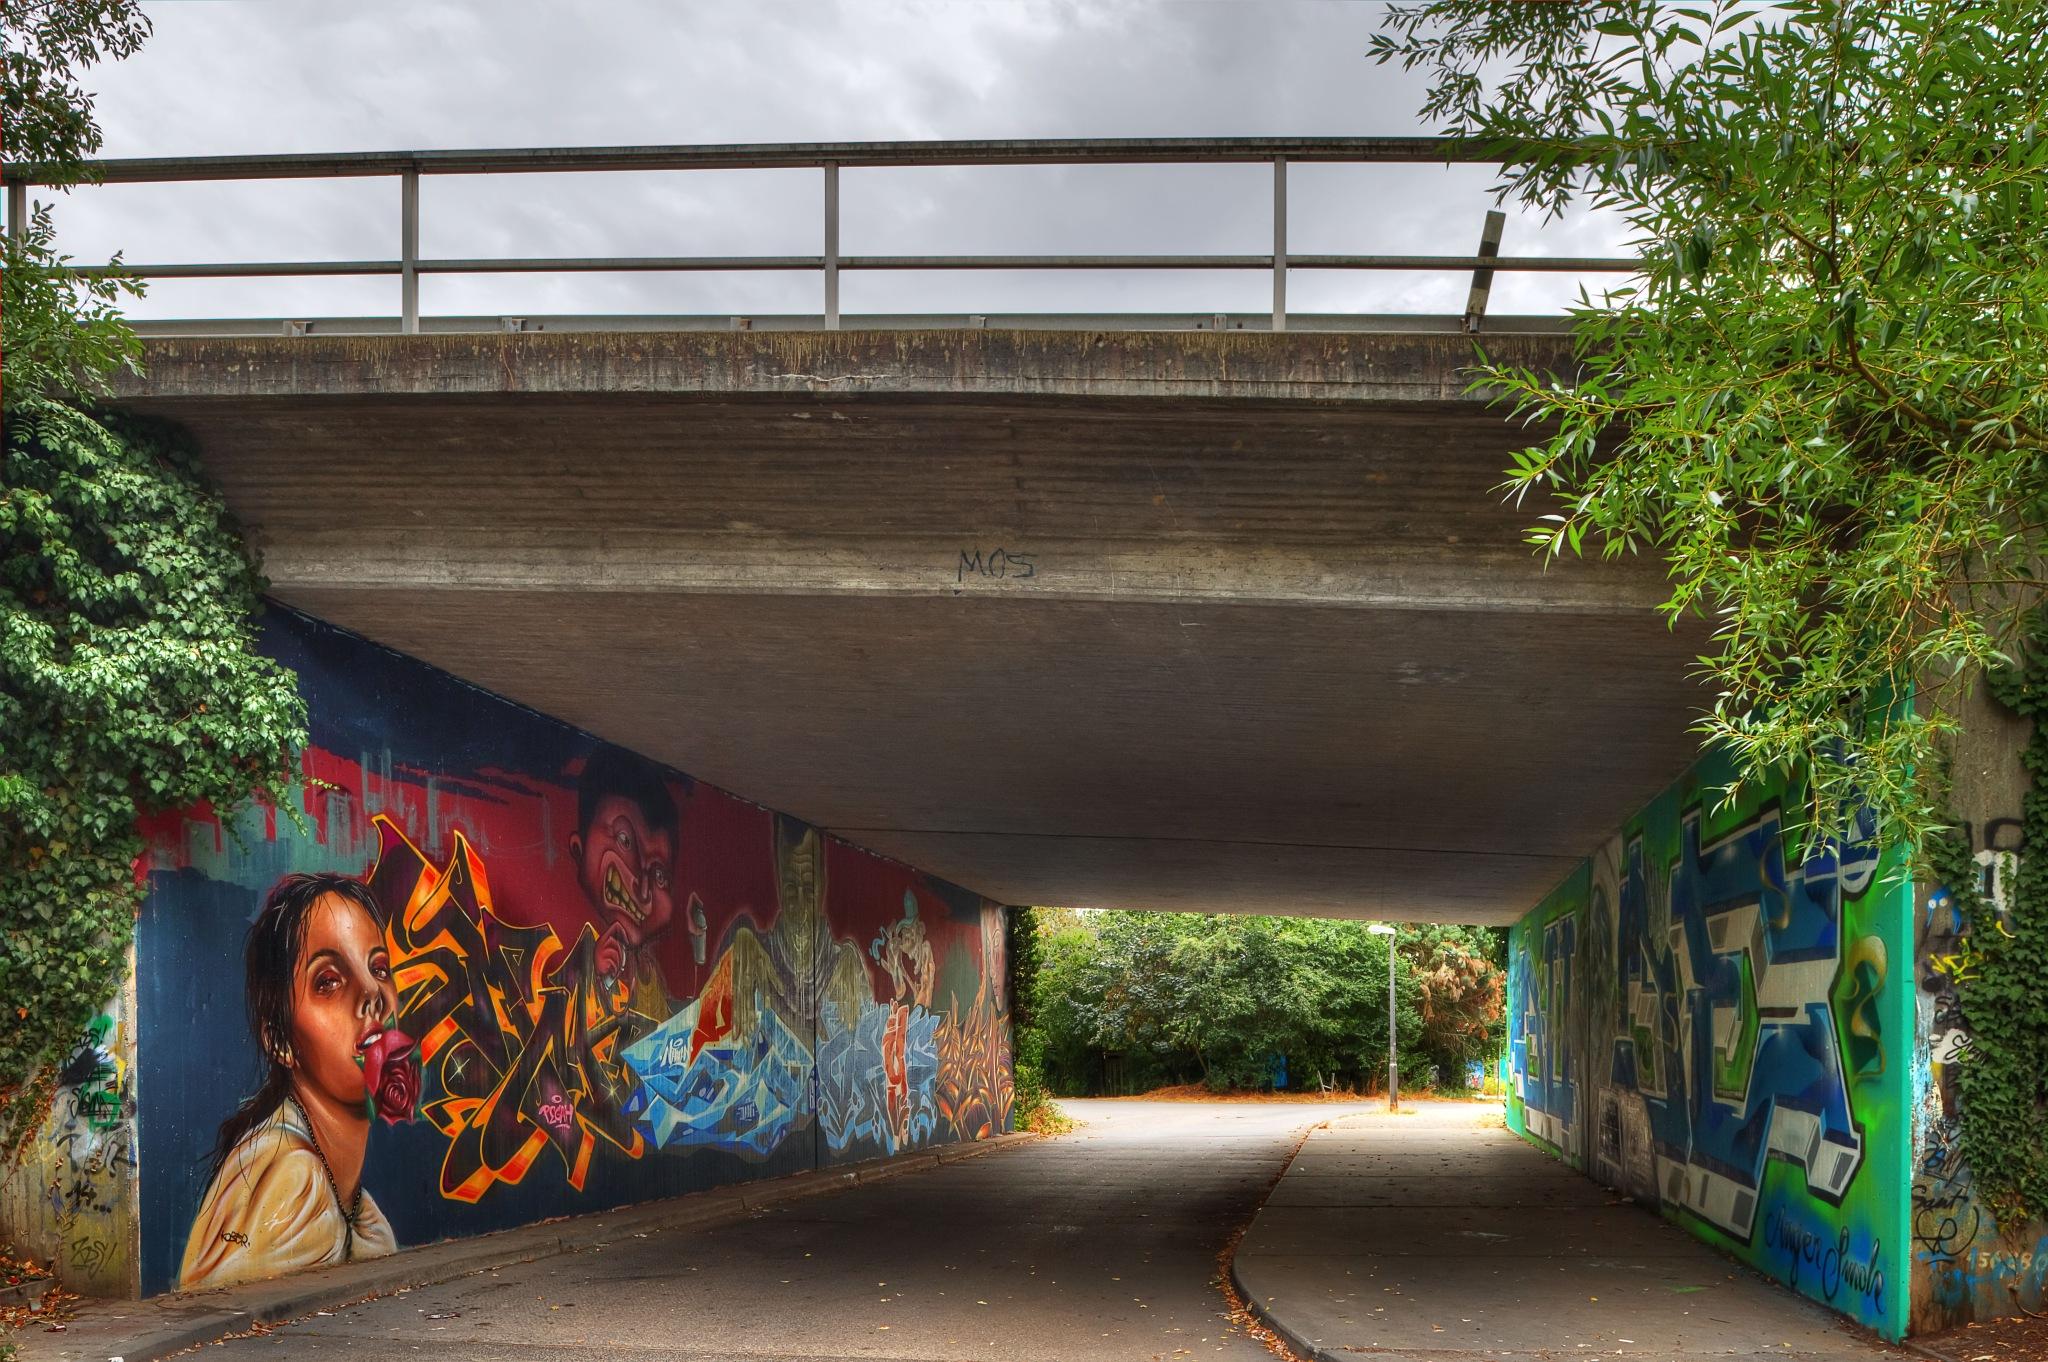 Underpass by Hartmut Ustorf